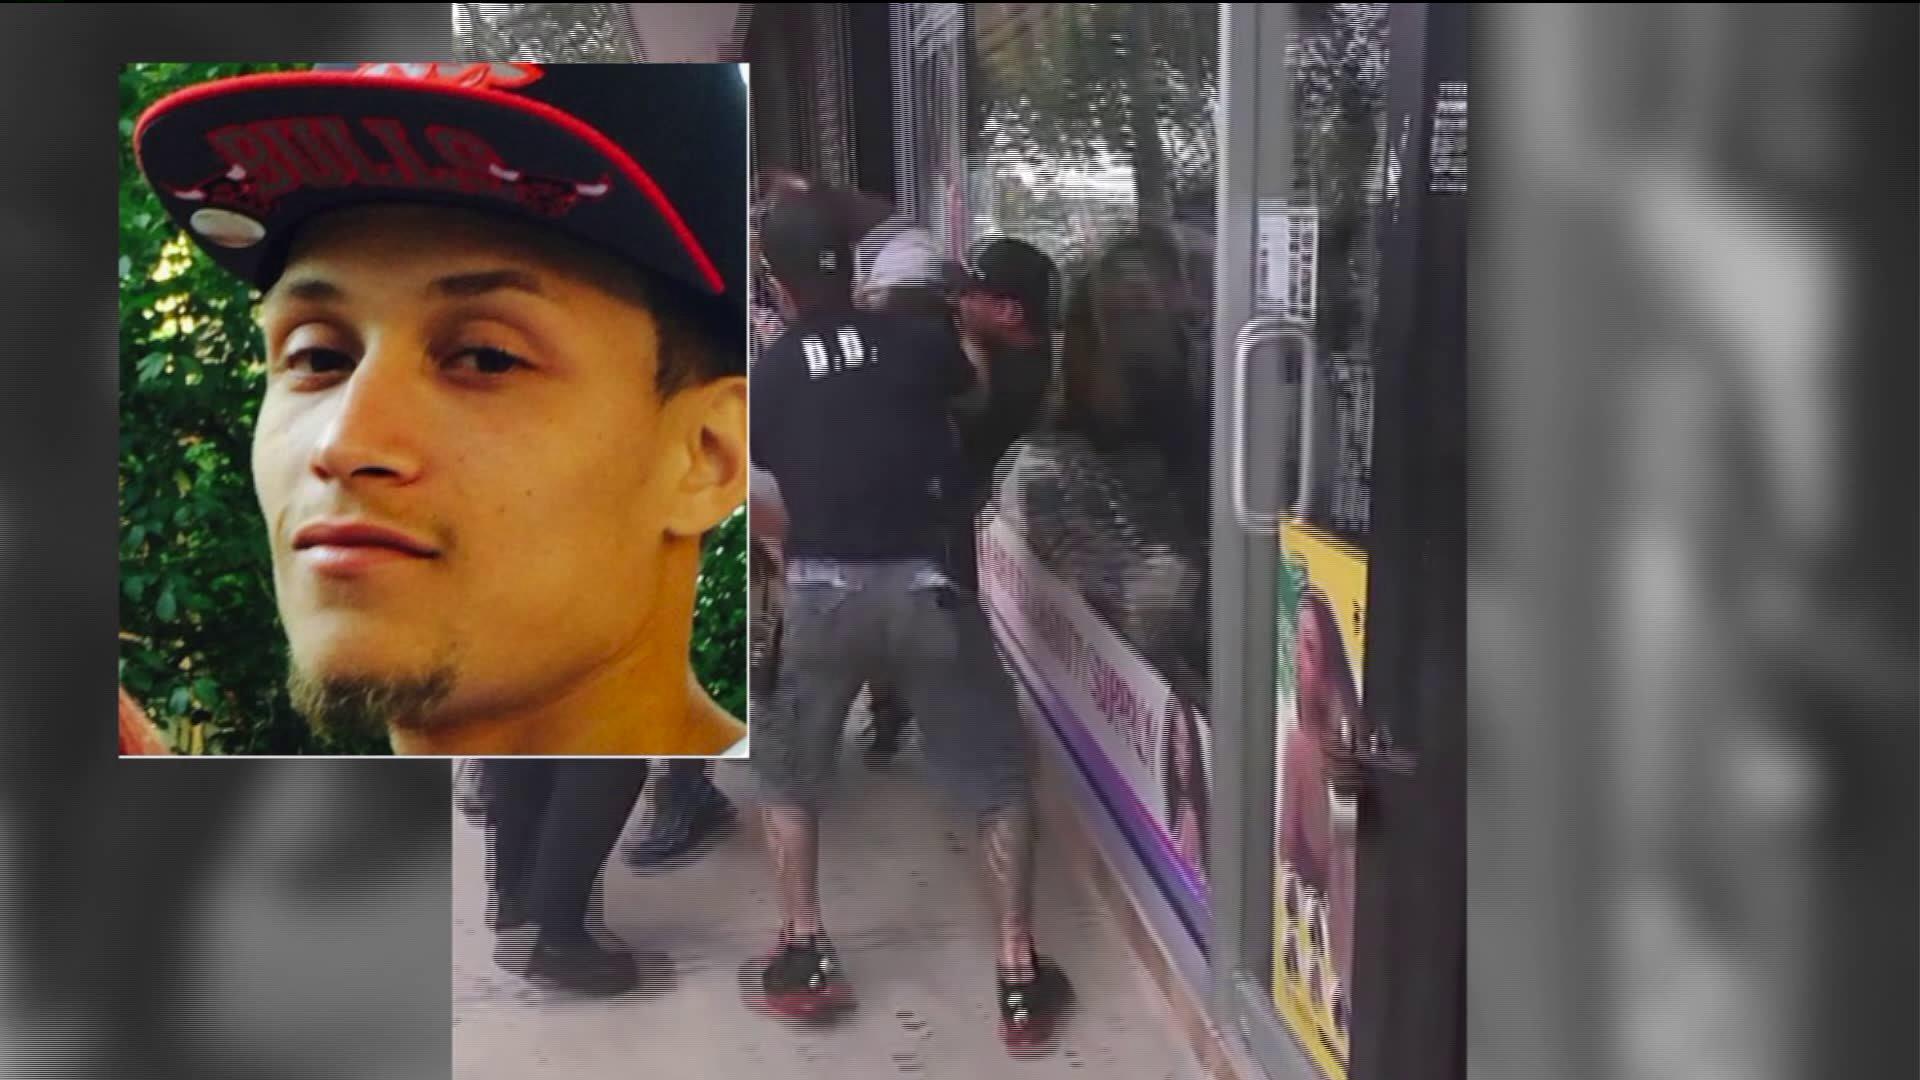 Man who filmed Eric Garner chokehold sues New York City forretaliation